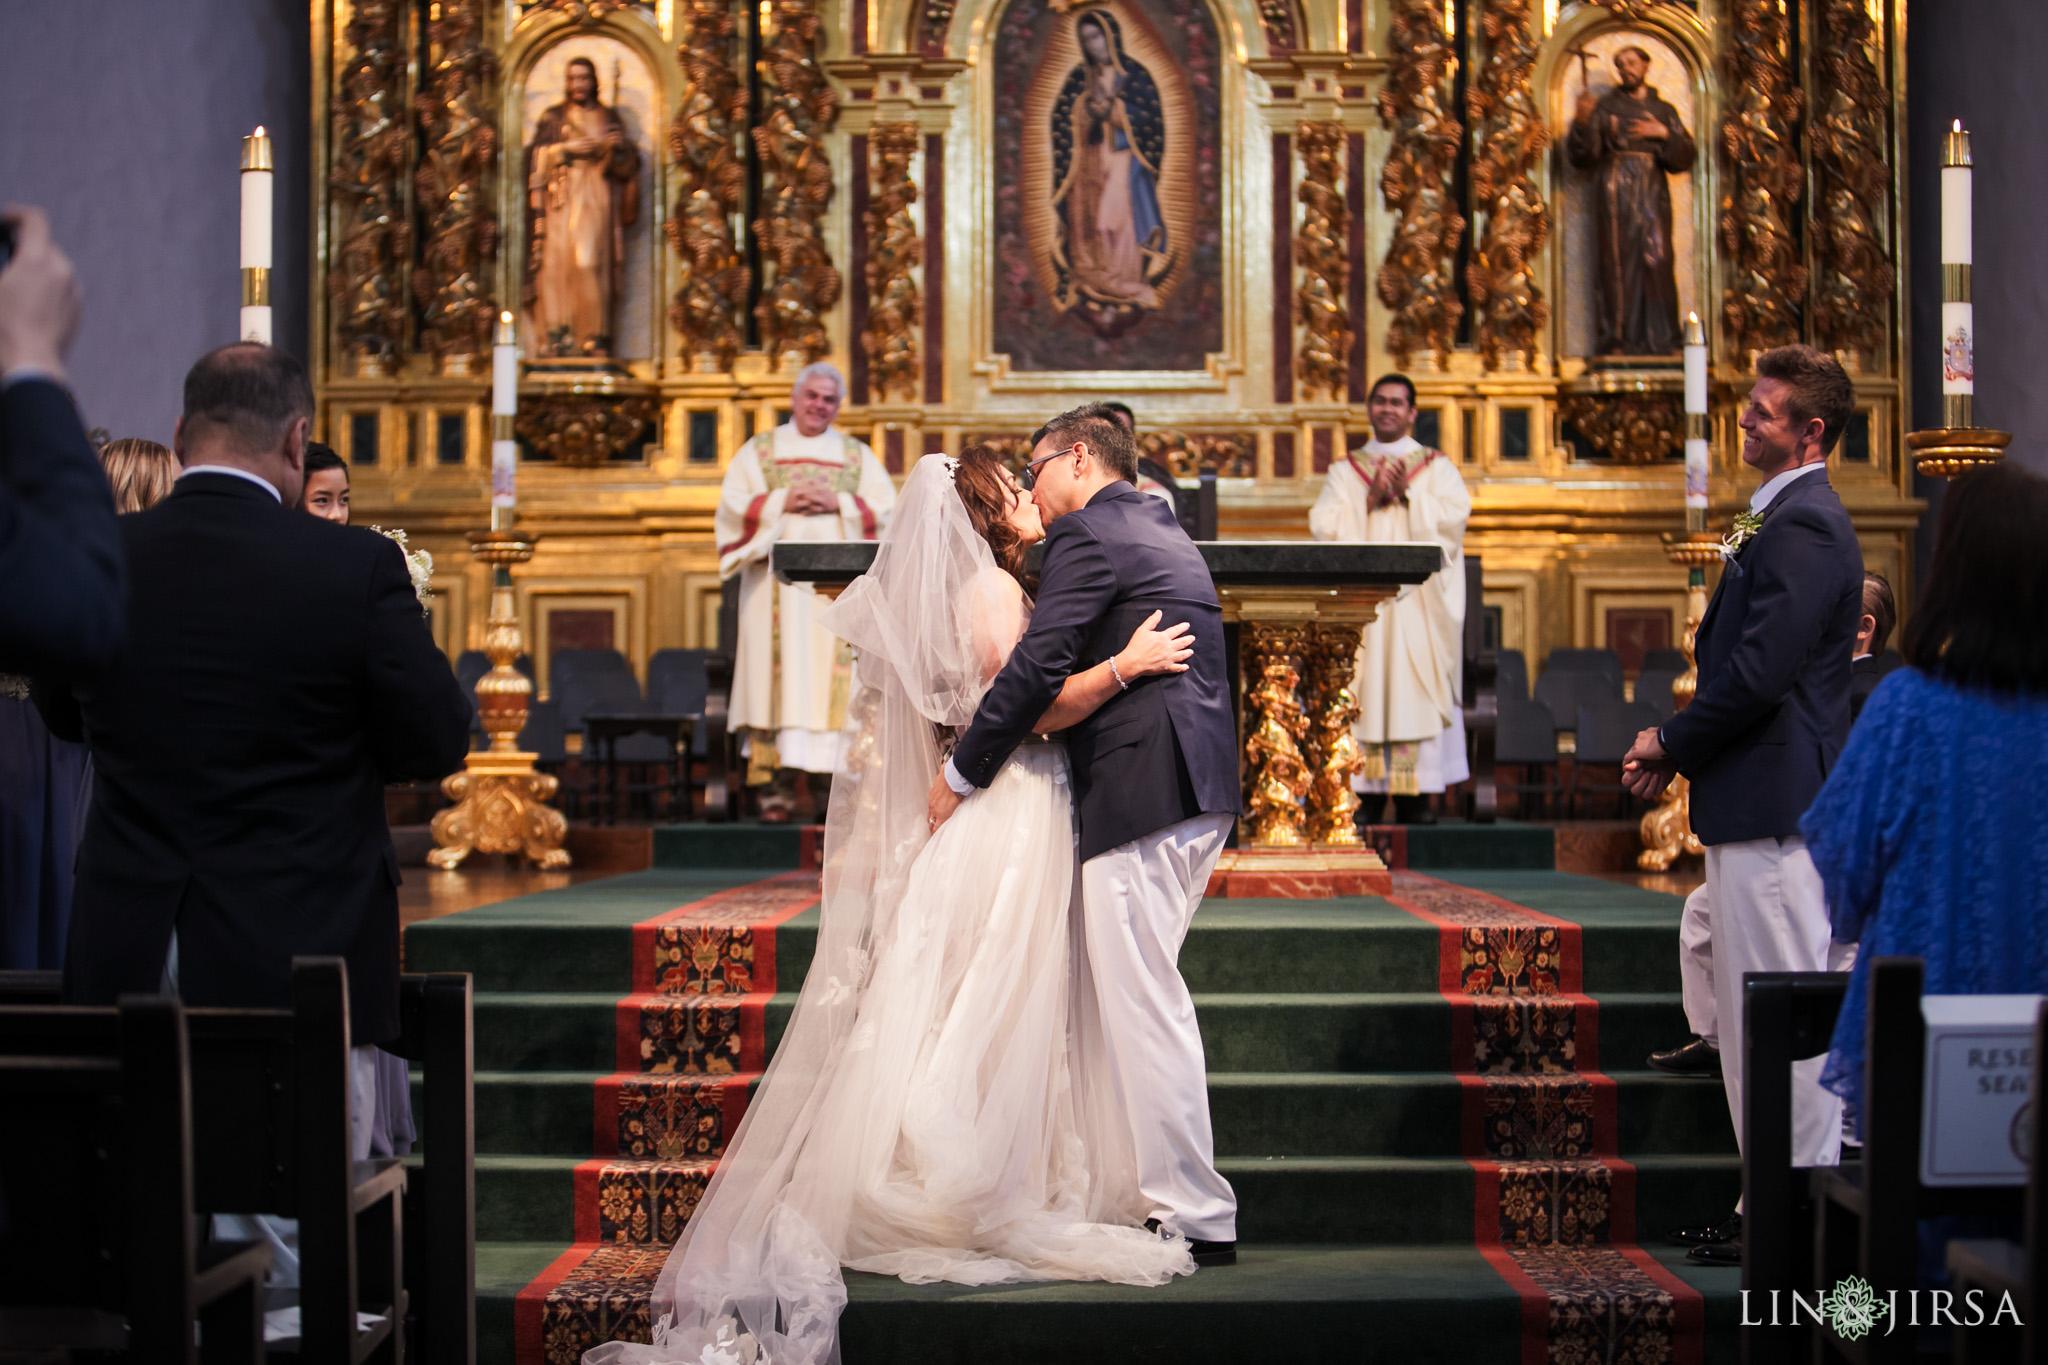 016 mission basilica san juan capistrano wedding ceremony photography